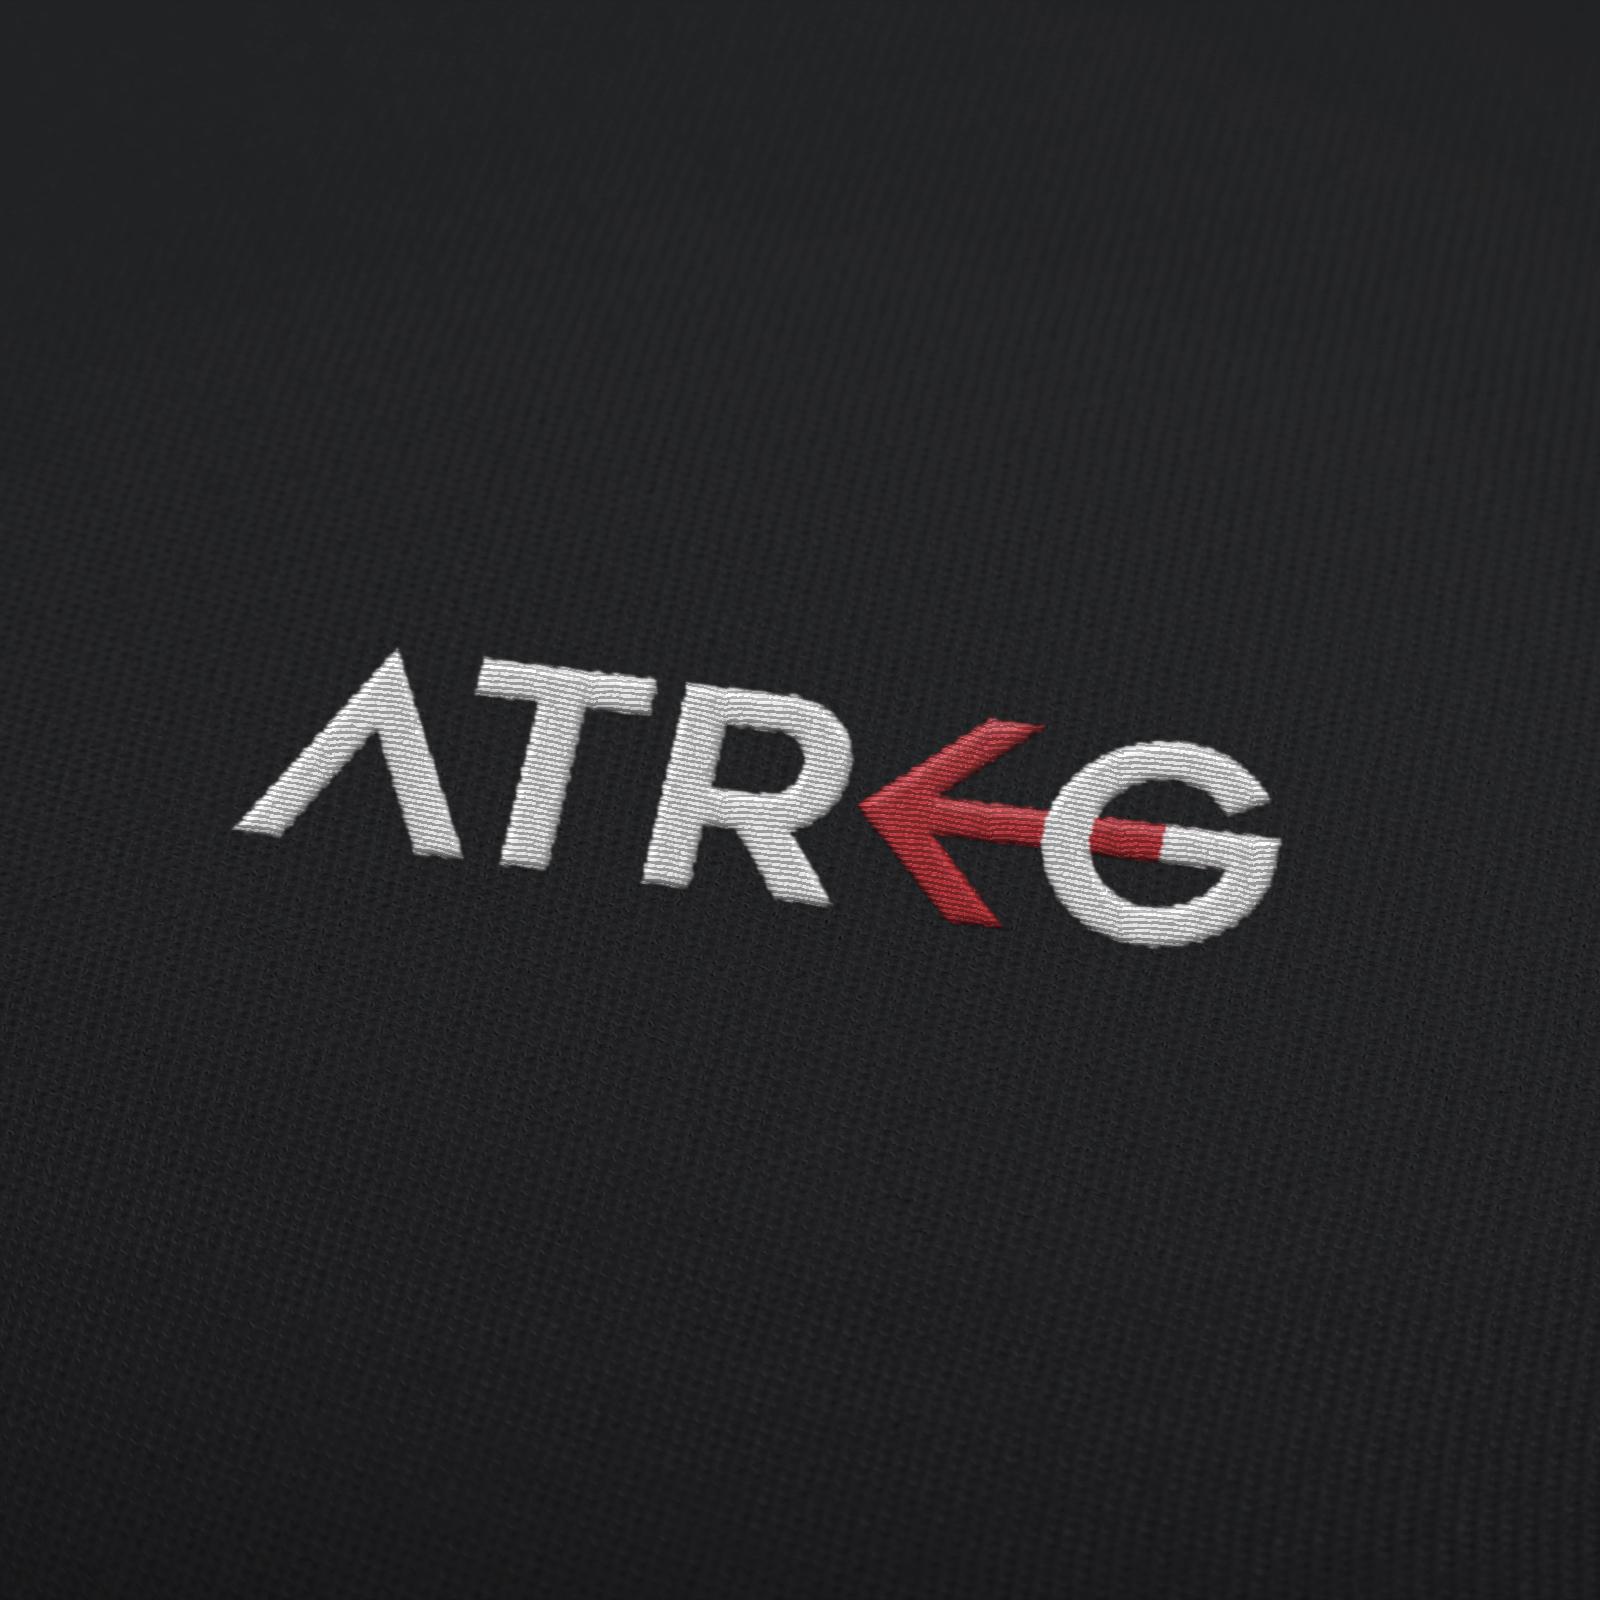 atreg_nevjegy